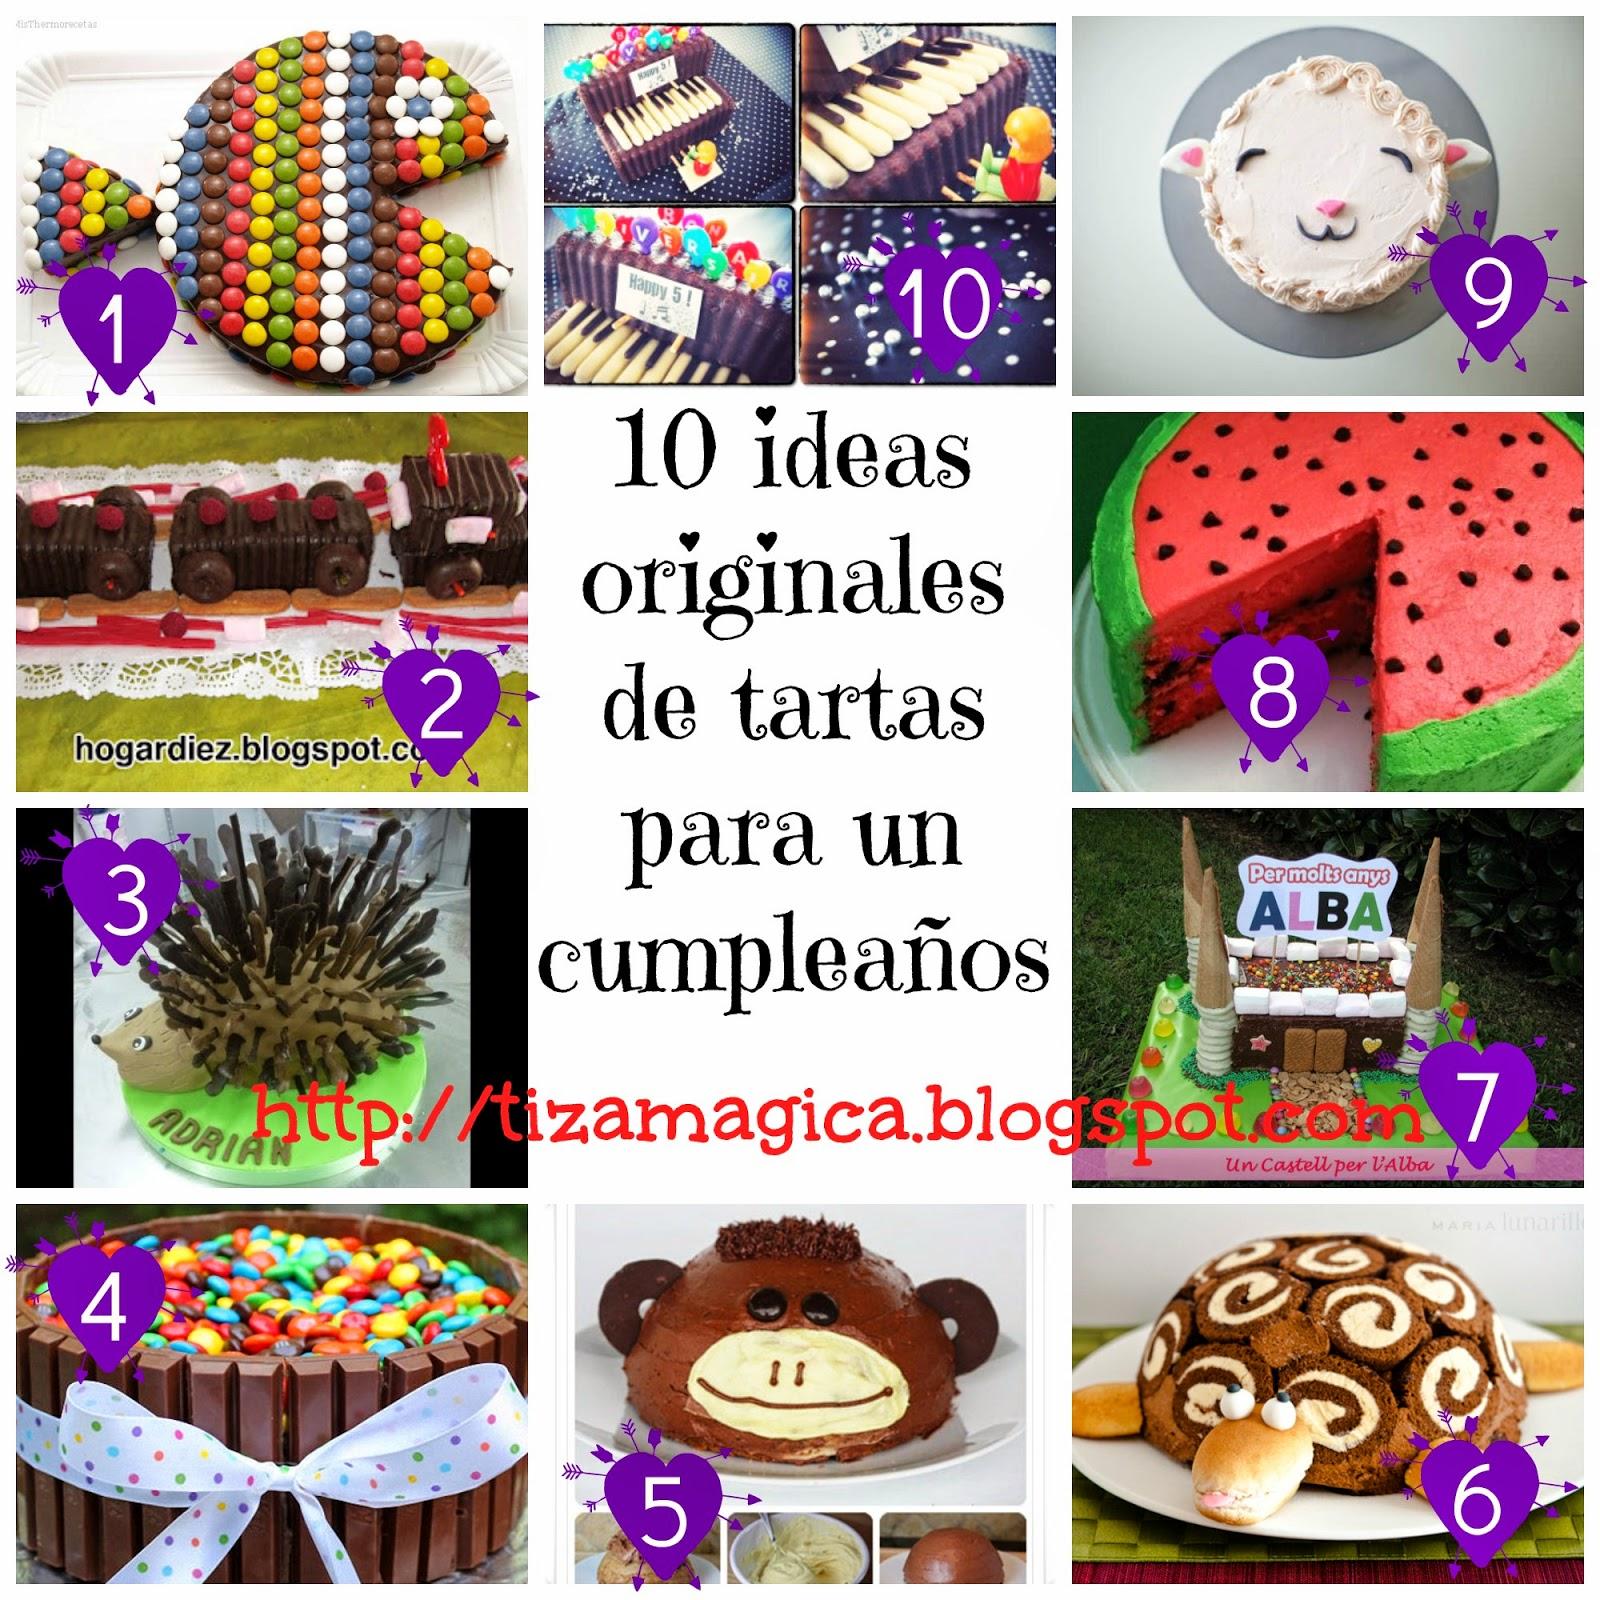 La Tiza Magica Tartas De Cumpleanos Originales Y Rapidas - Tartas-de-cumpleaos-sencillas-y-originales